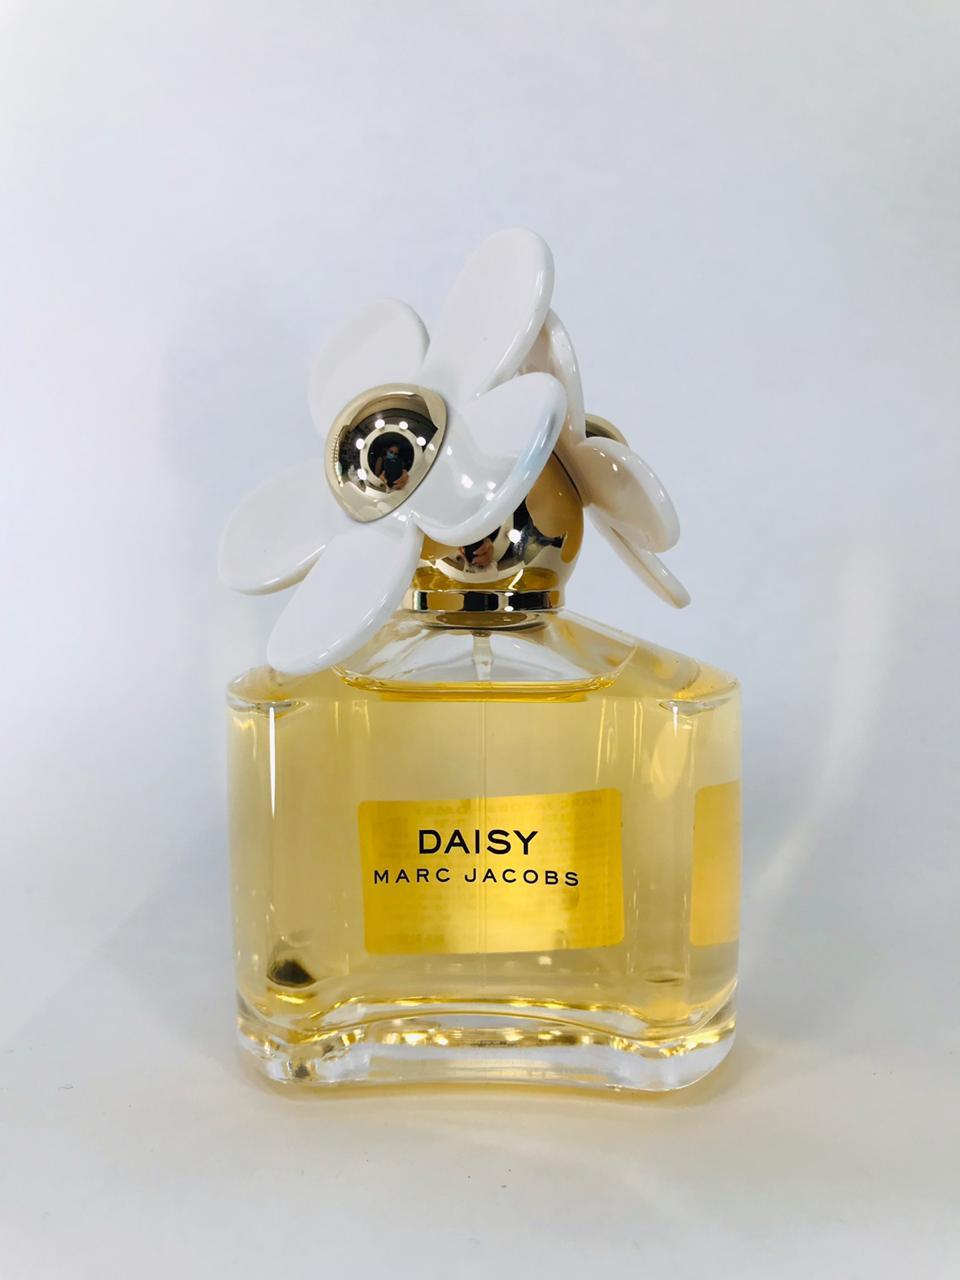 Daisy Marc Jacobs Feminino Eau de Toilette 100ml - TESTER